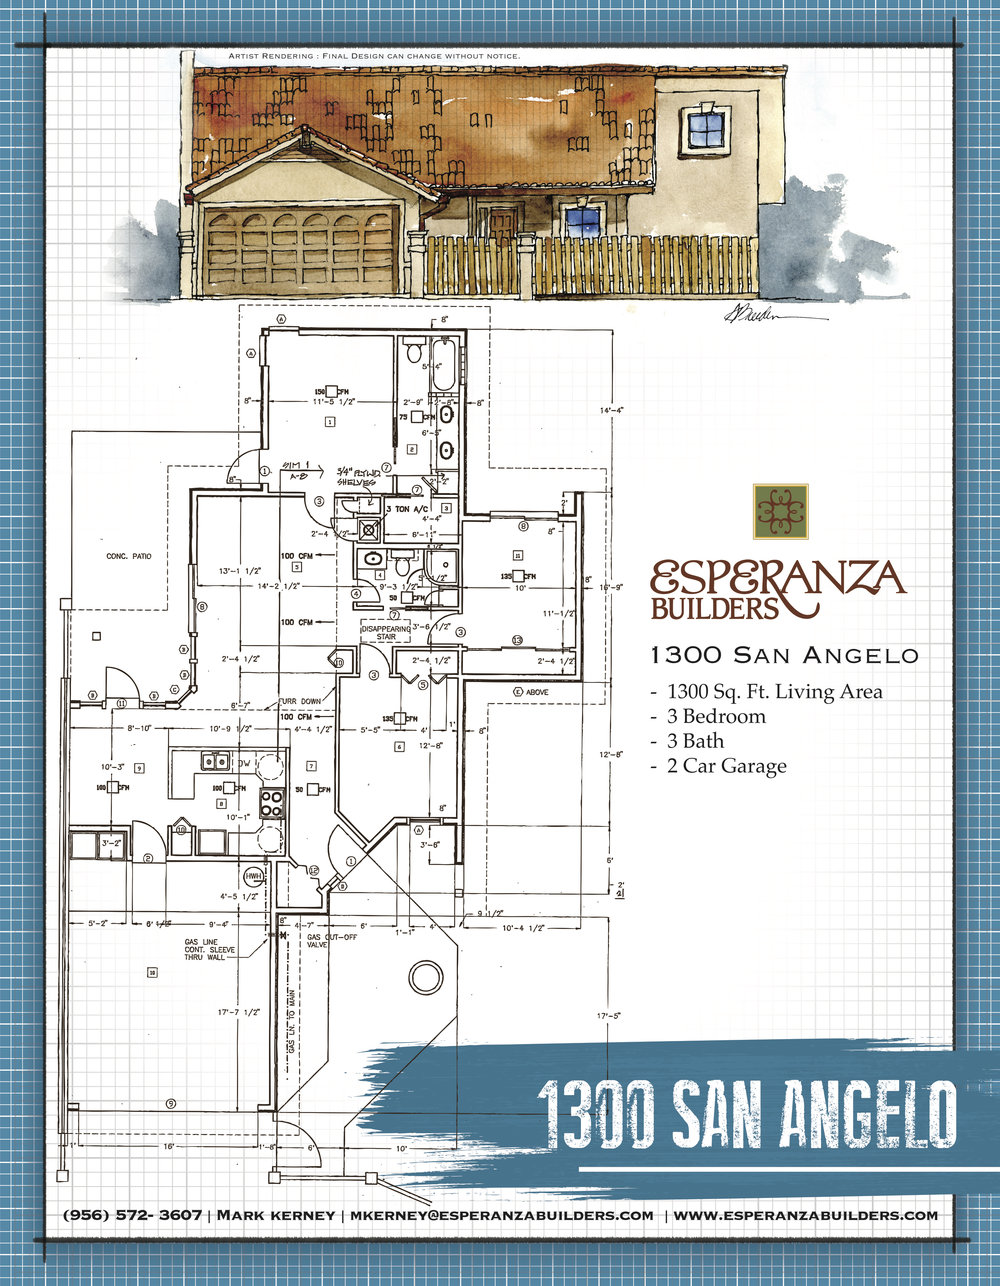 0119-07 Esperanza Group 8x5 Insert BG-1300-SanAngelo copy.jpg